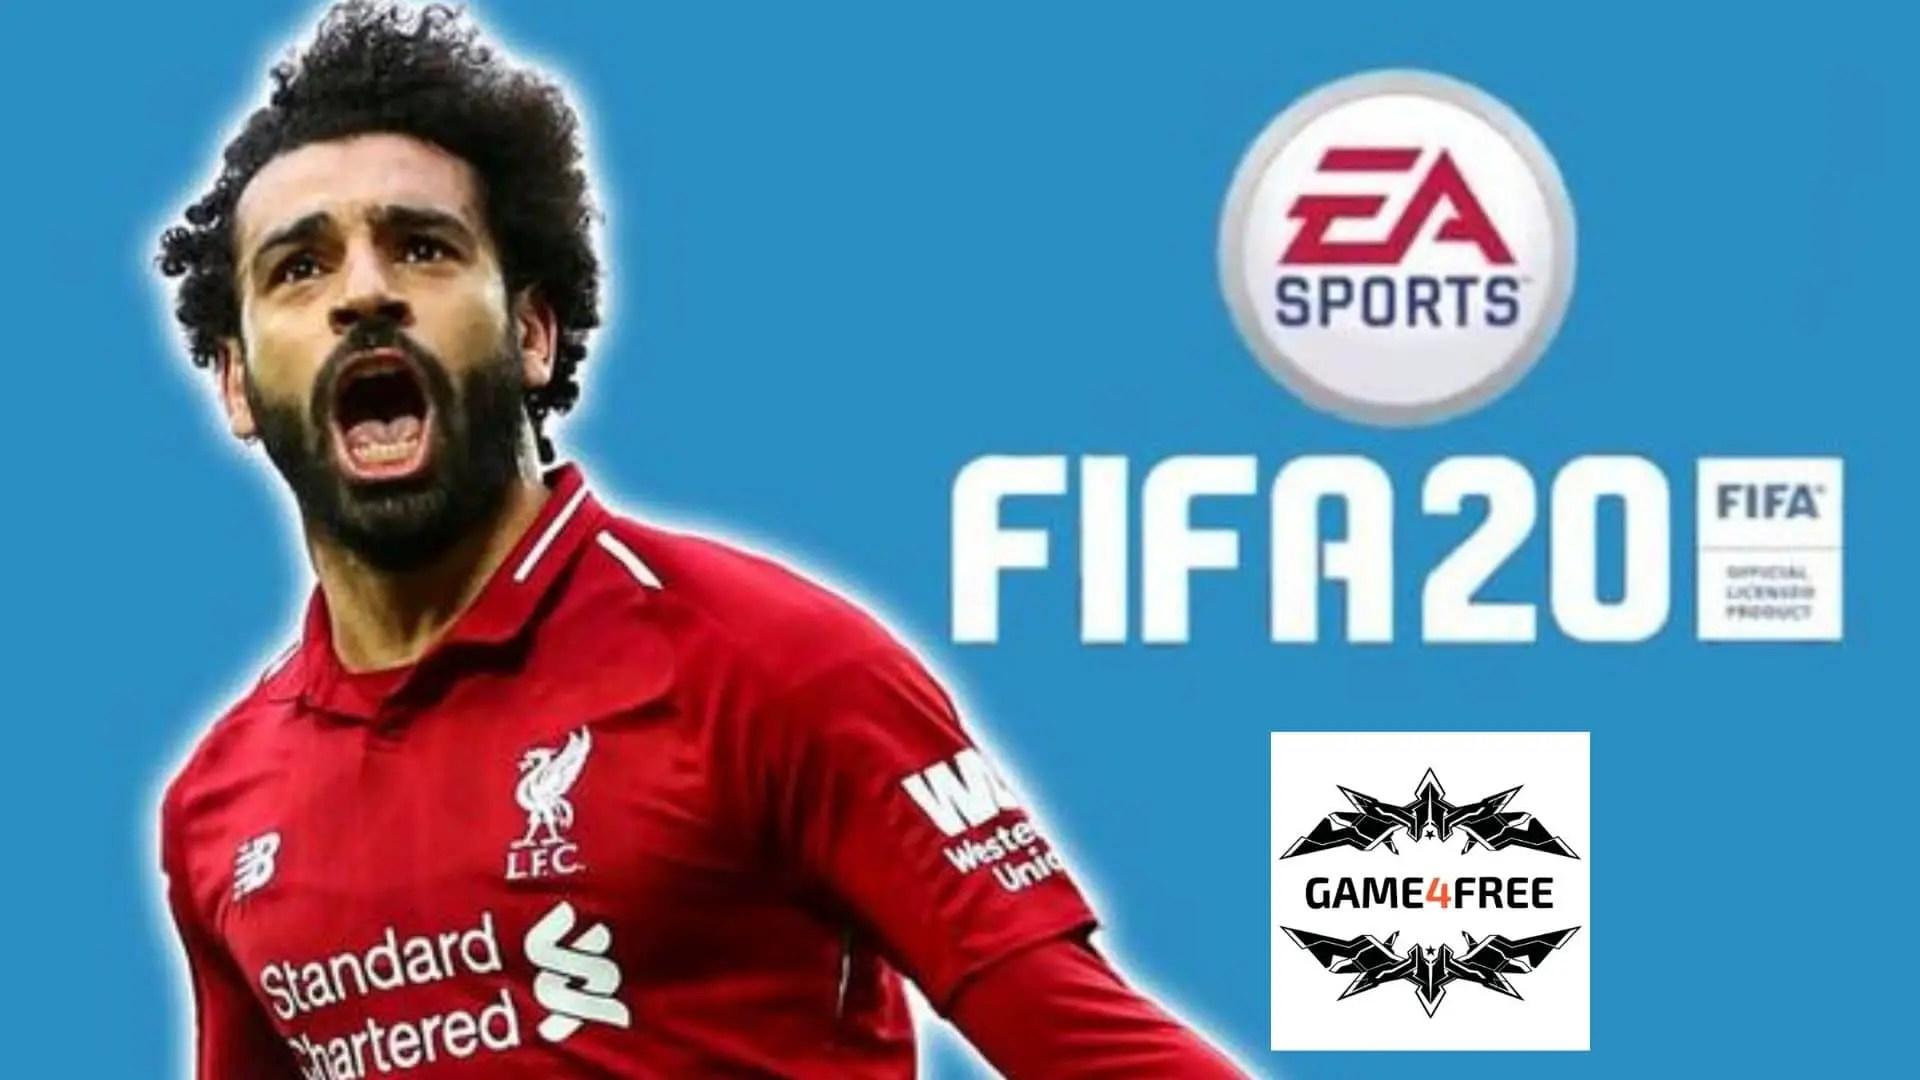 E3 2019 : Le mode FIFA Street-Style Volta de FIFA 20 dévoilé avant l'EA Play